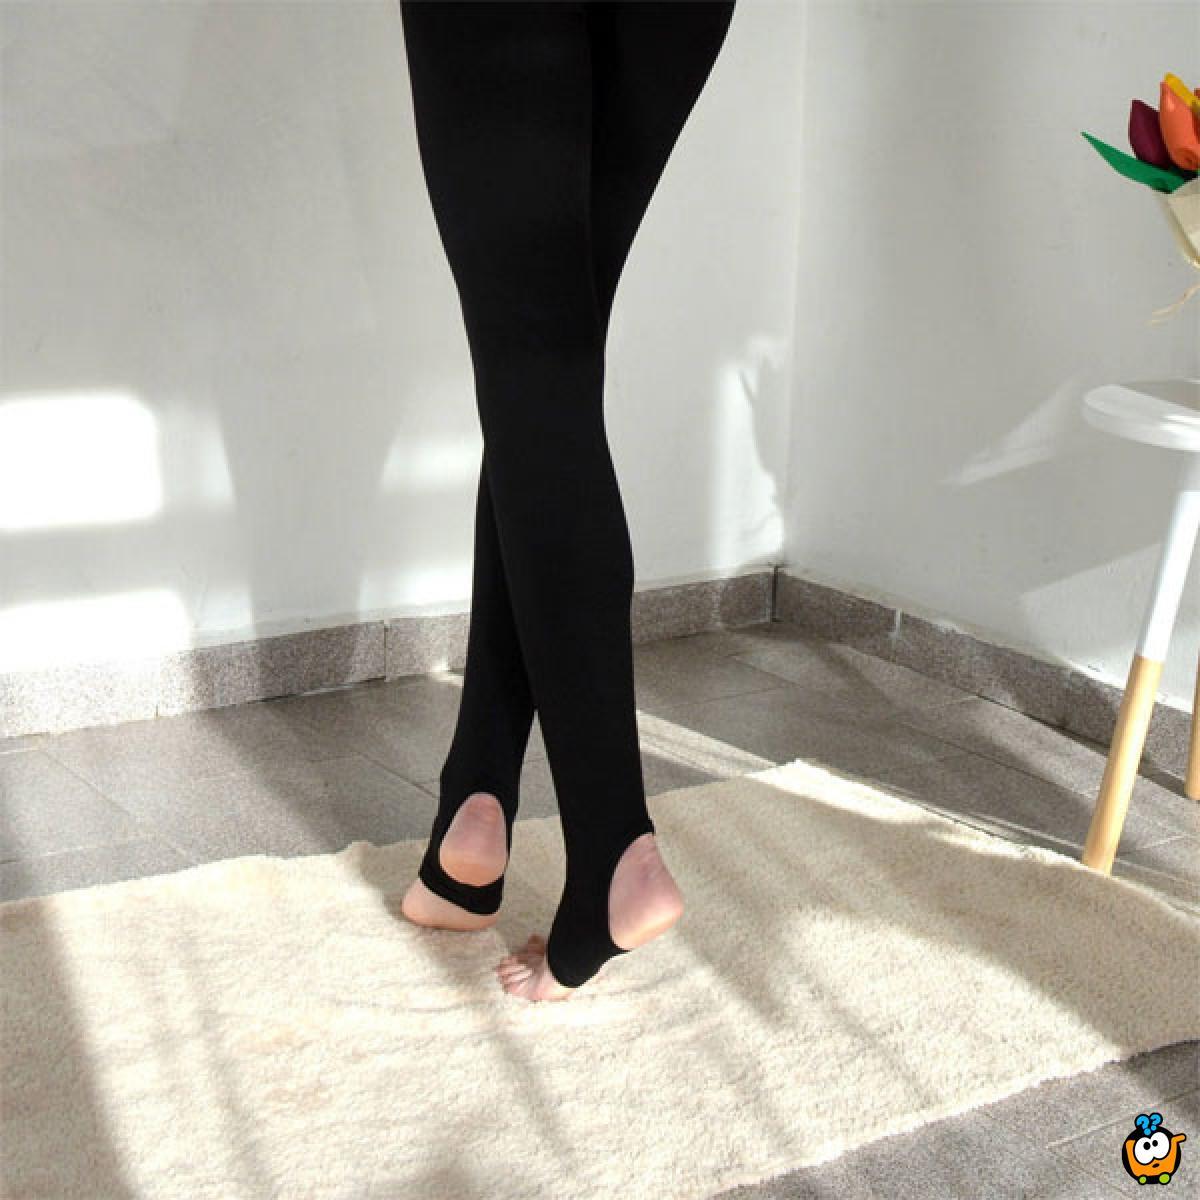 Univerzalne crne unihop čarape bez stopala